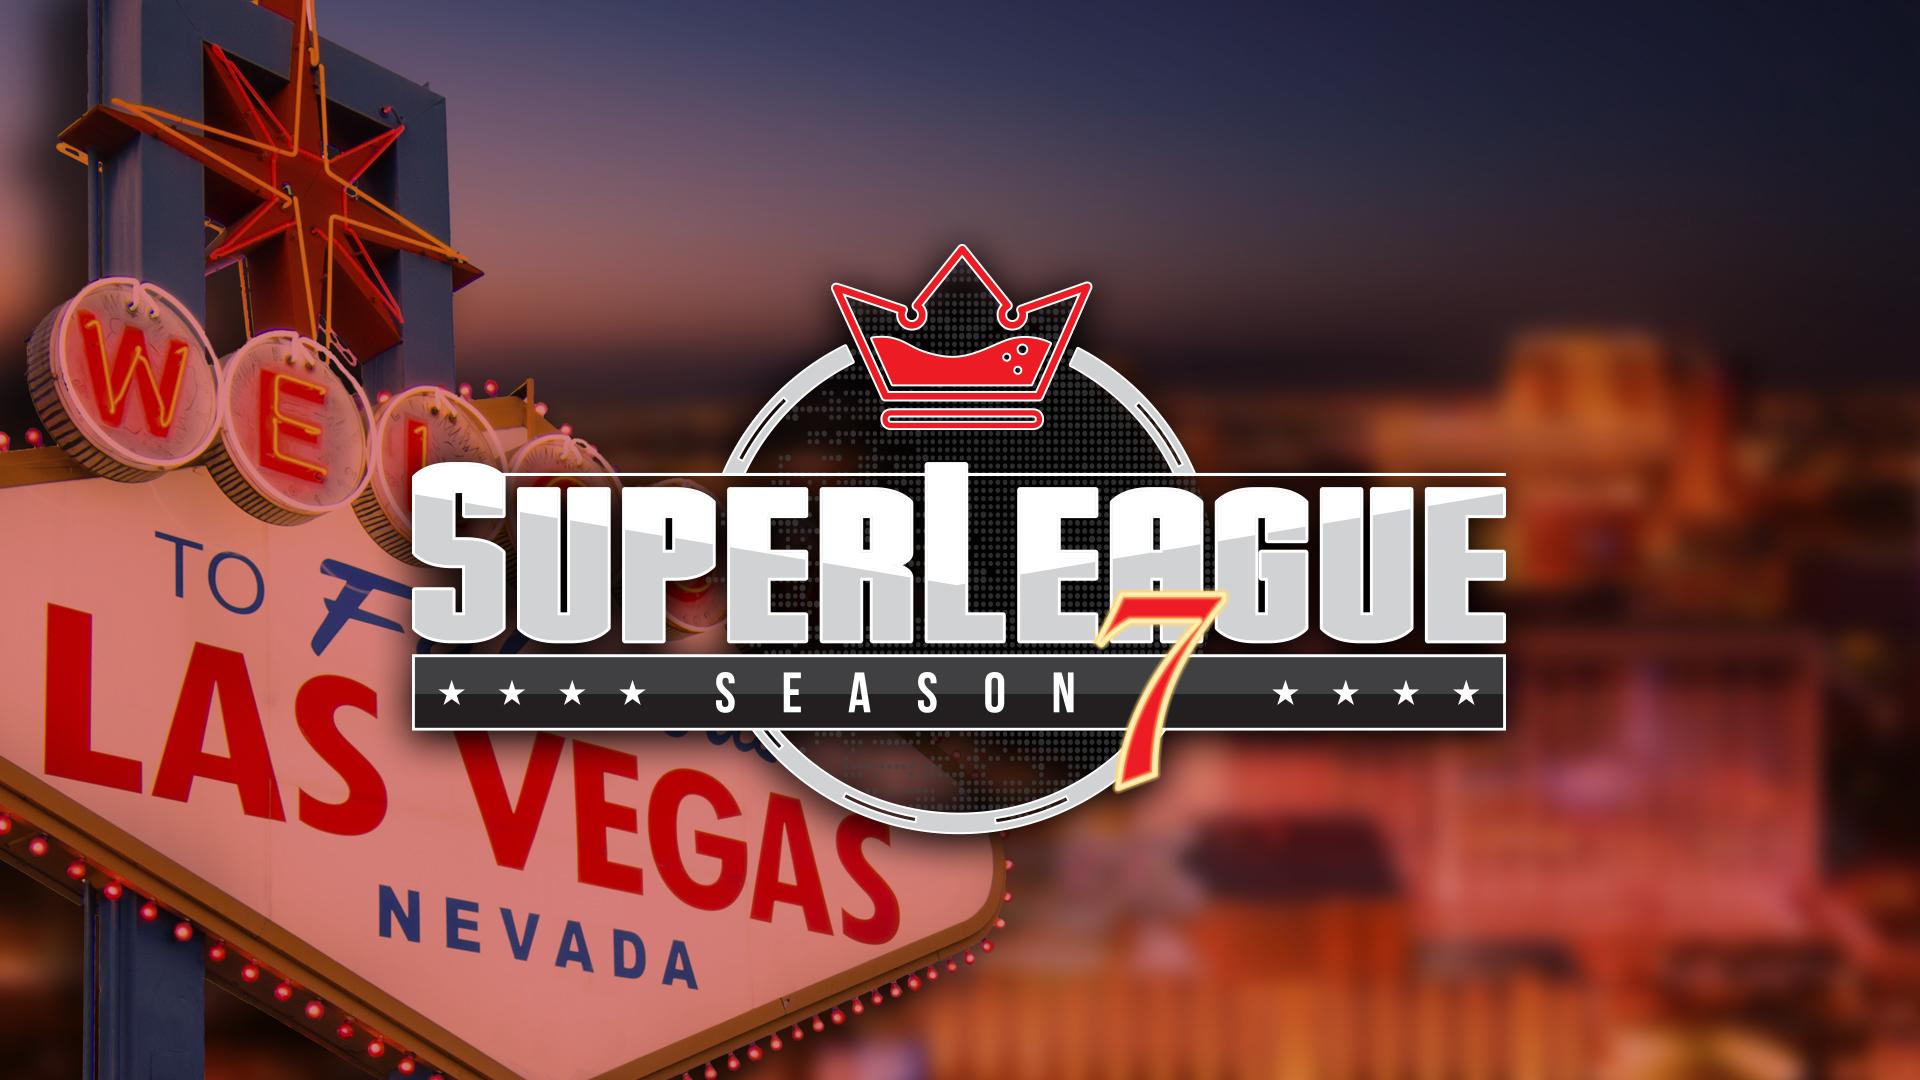 Bar Poker Open » Super League - Season 7 (10/1/18 - 5/5/19)